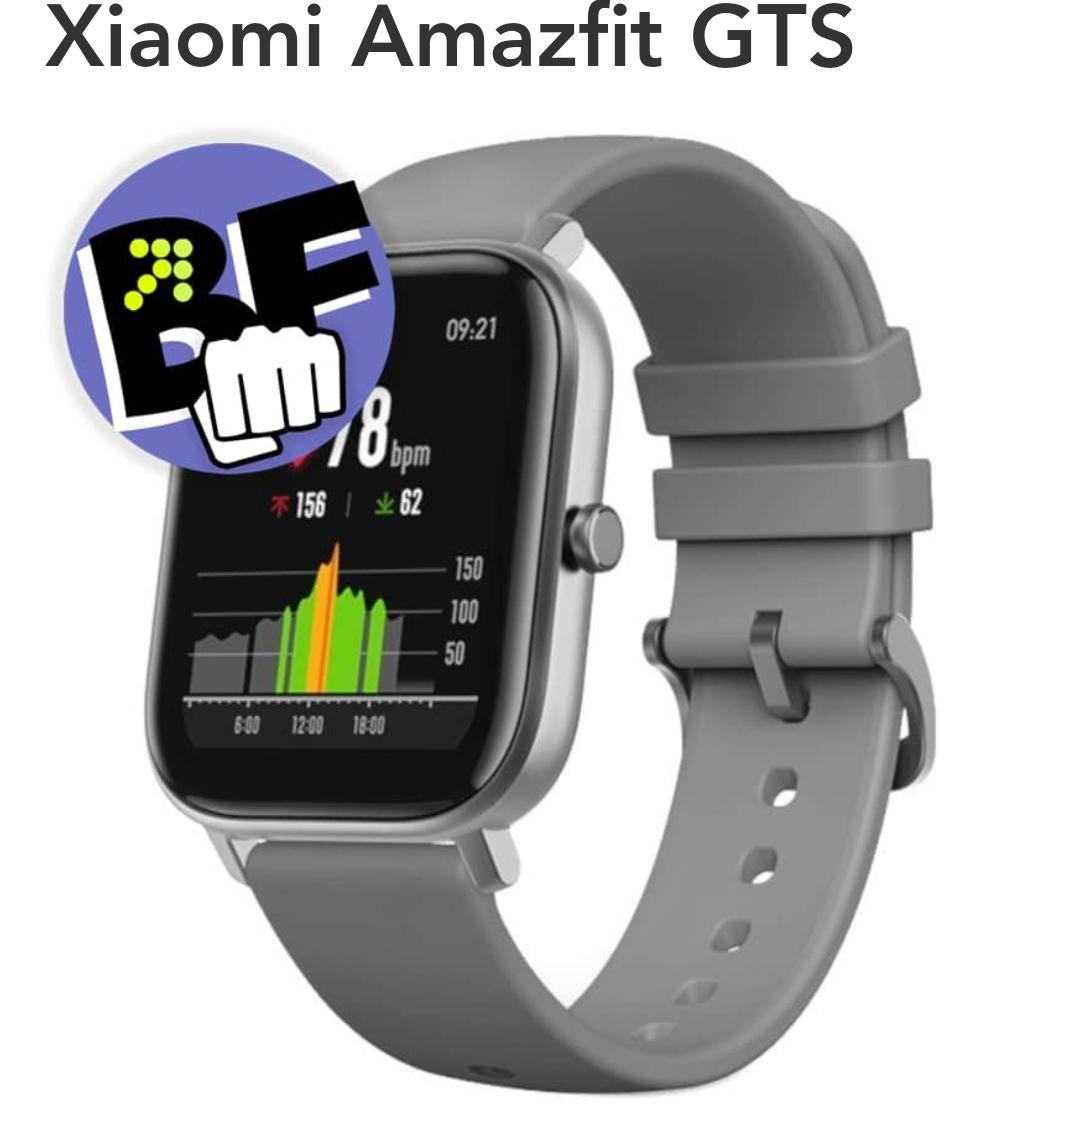 Amazfit gts Powerplanet 99€